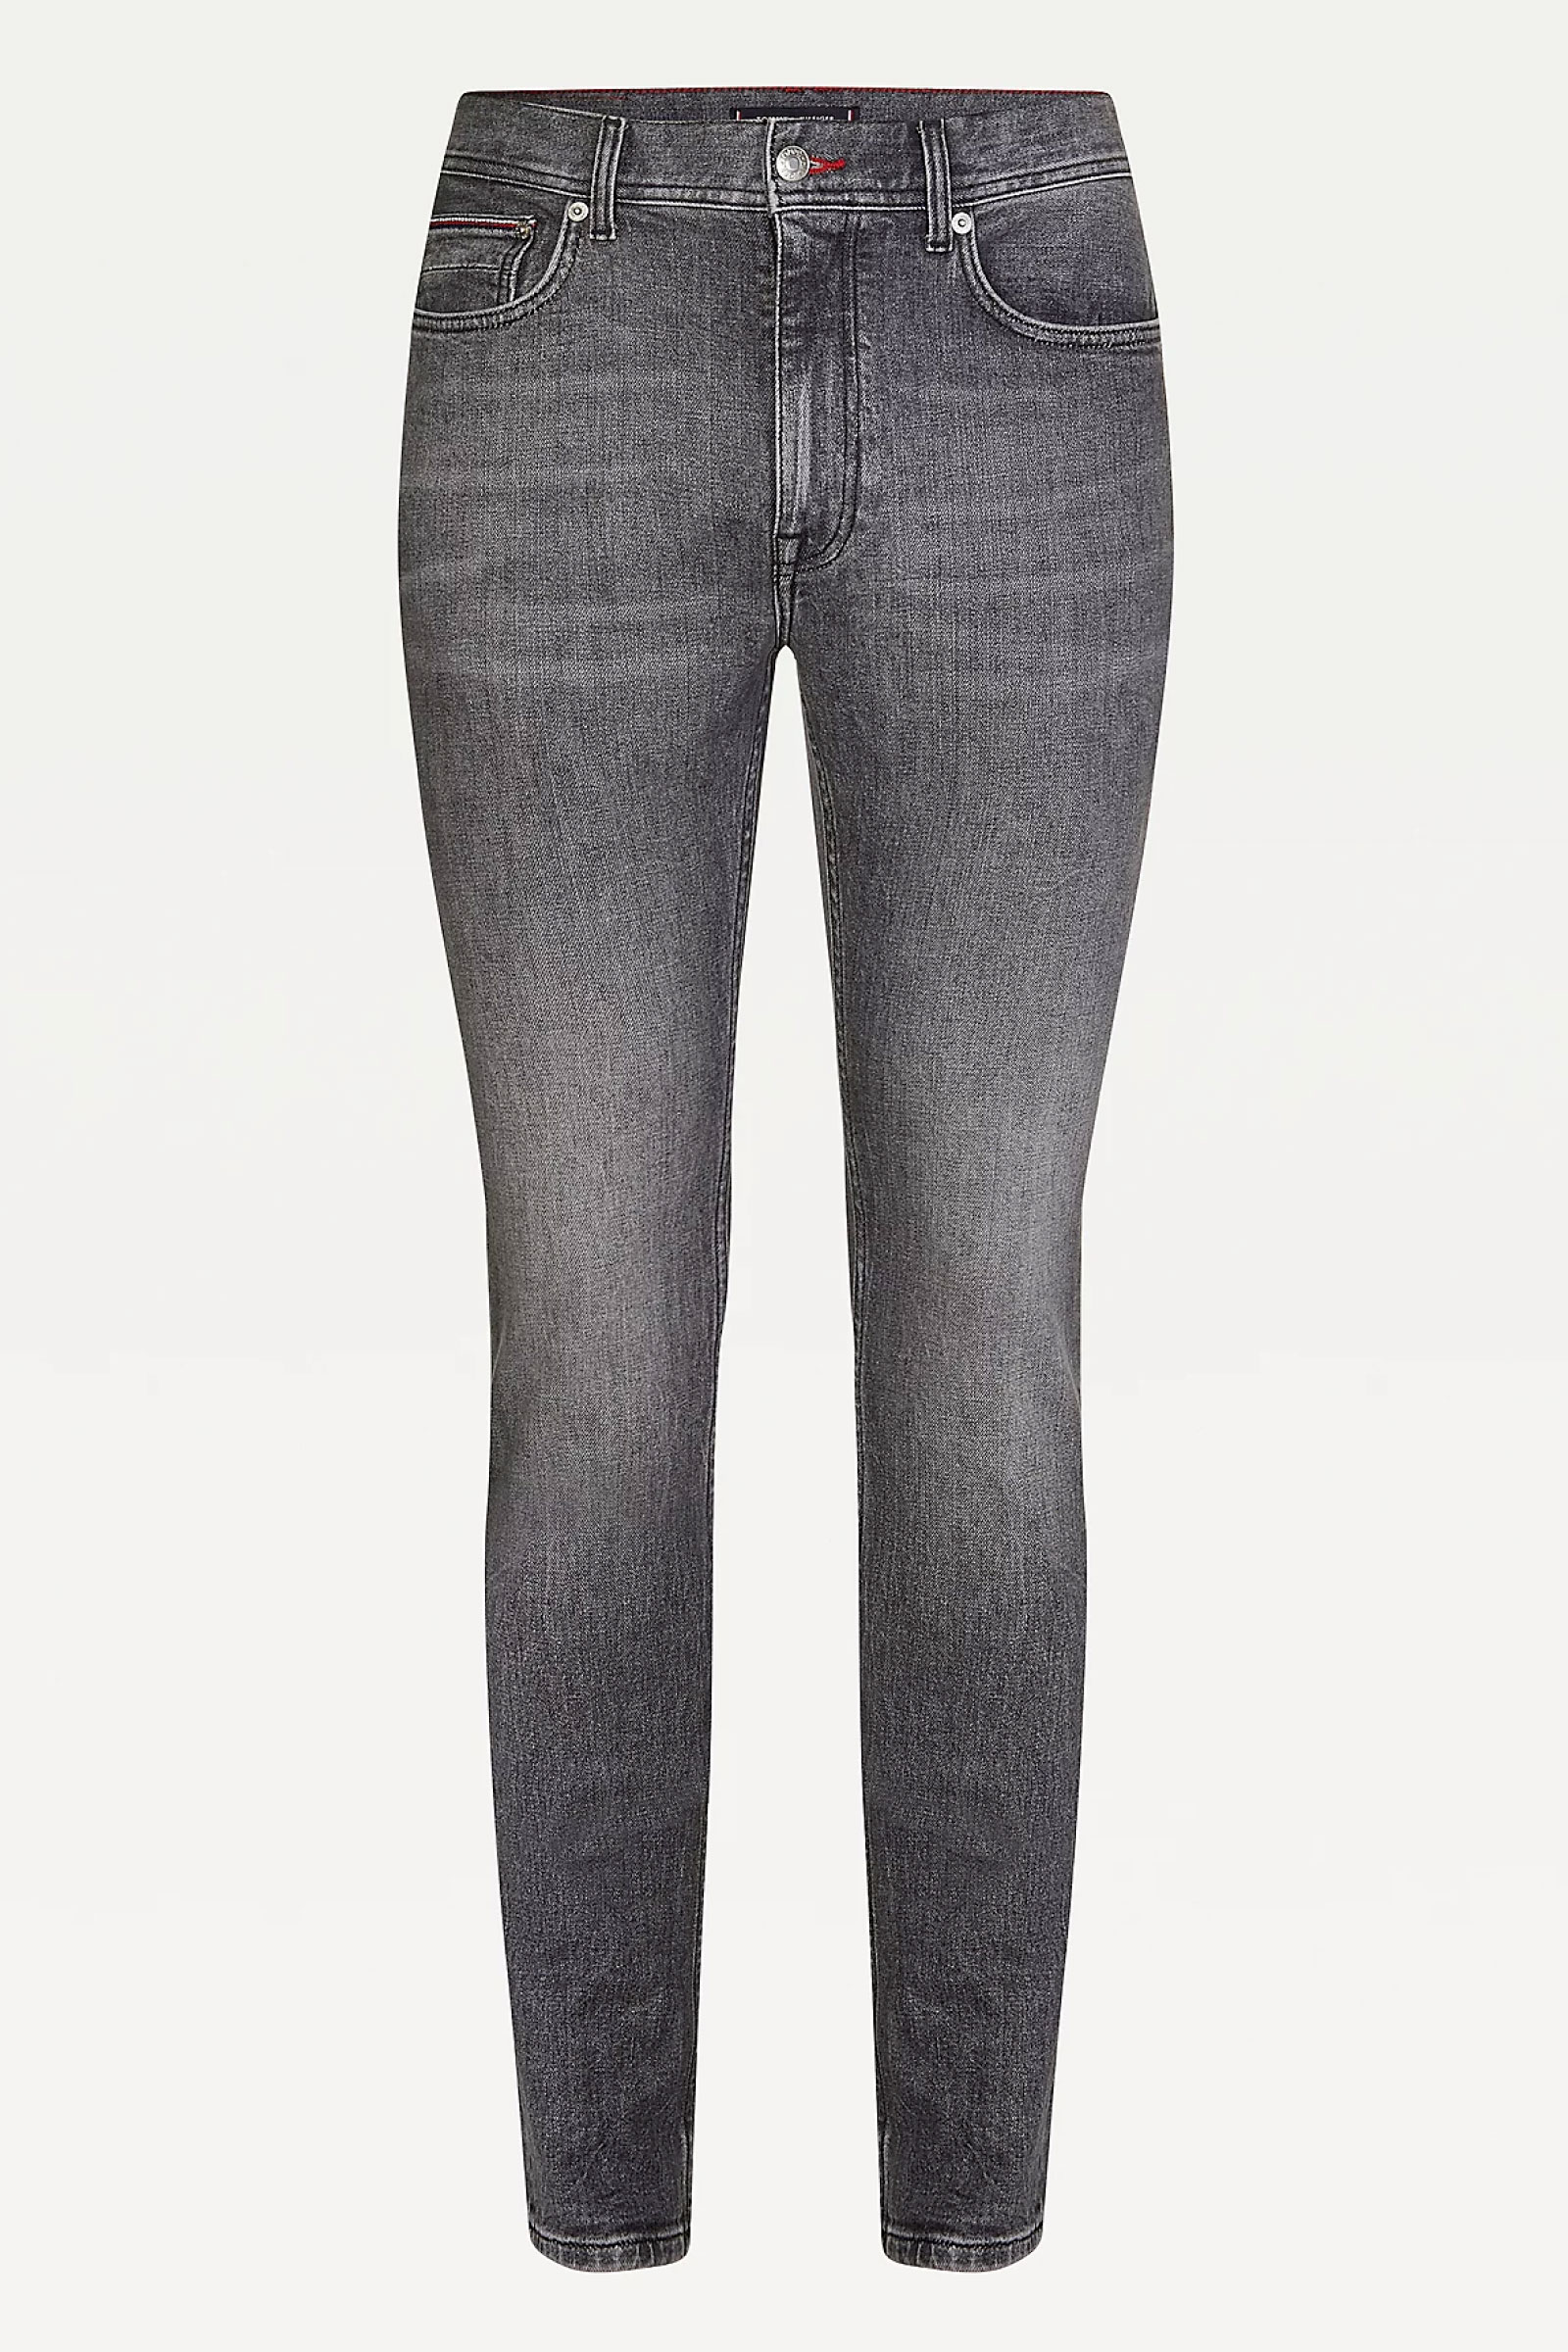 TOMMY HILFIGER | Jeans | MW0MW180321B2